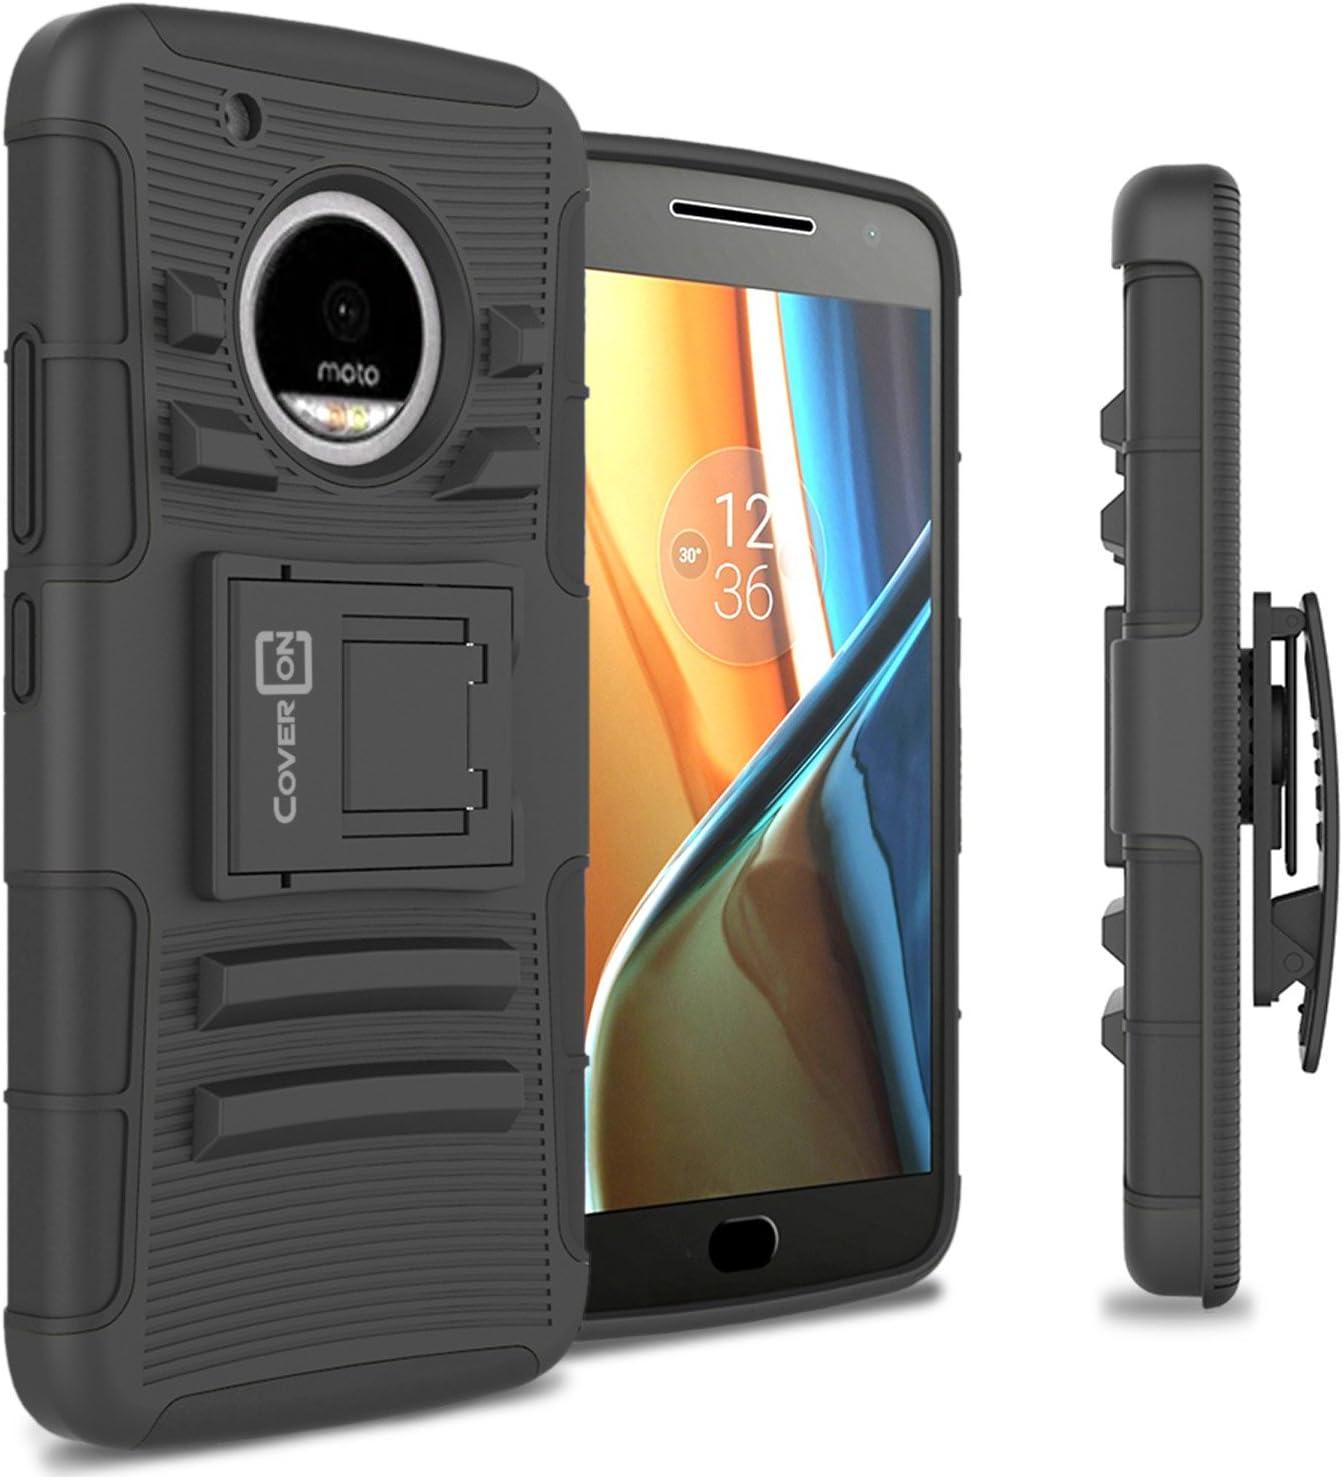 CoverON Kickstand Belt Clip Explorer Series for Motorola Moto G5 Plus/Moto X 2017 Holster Case, Black